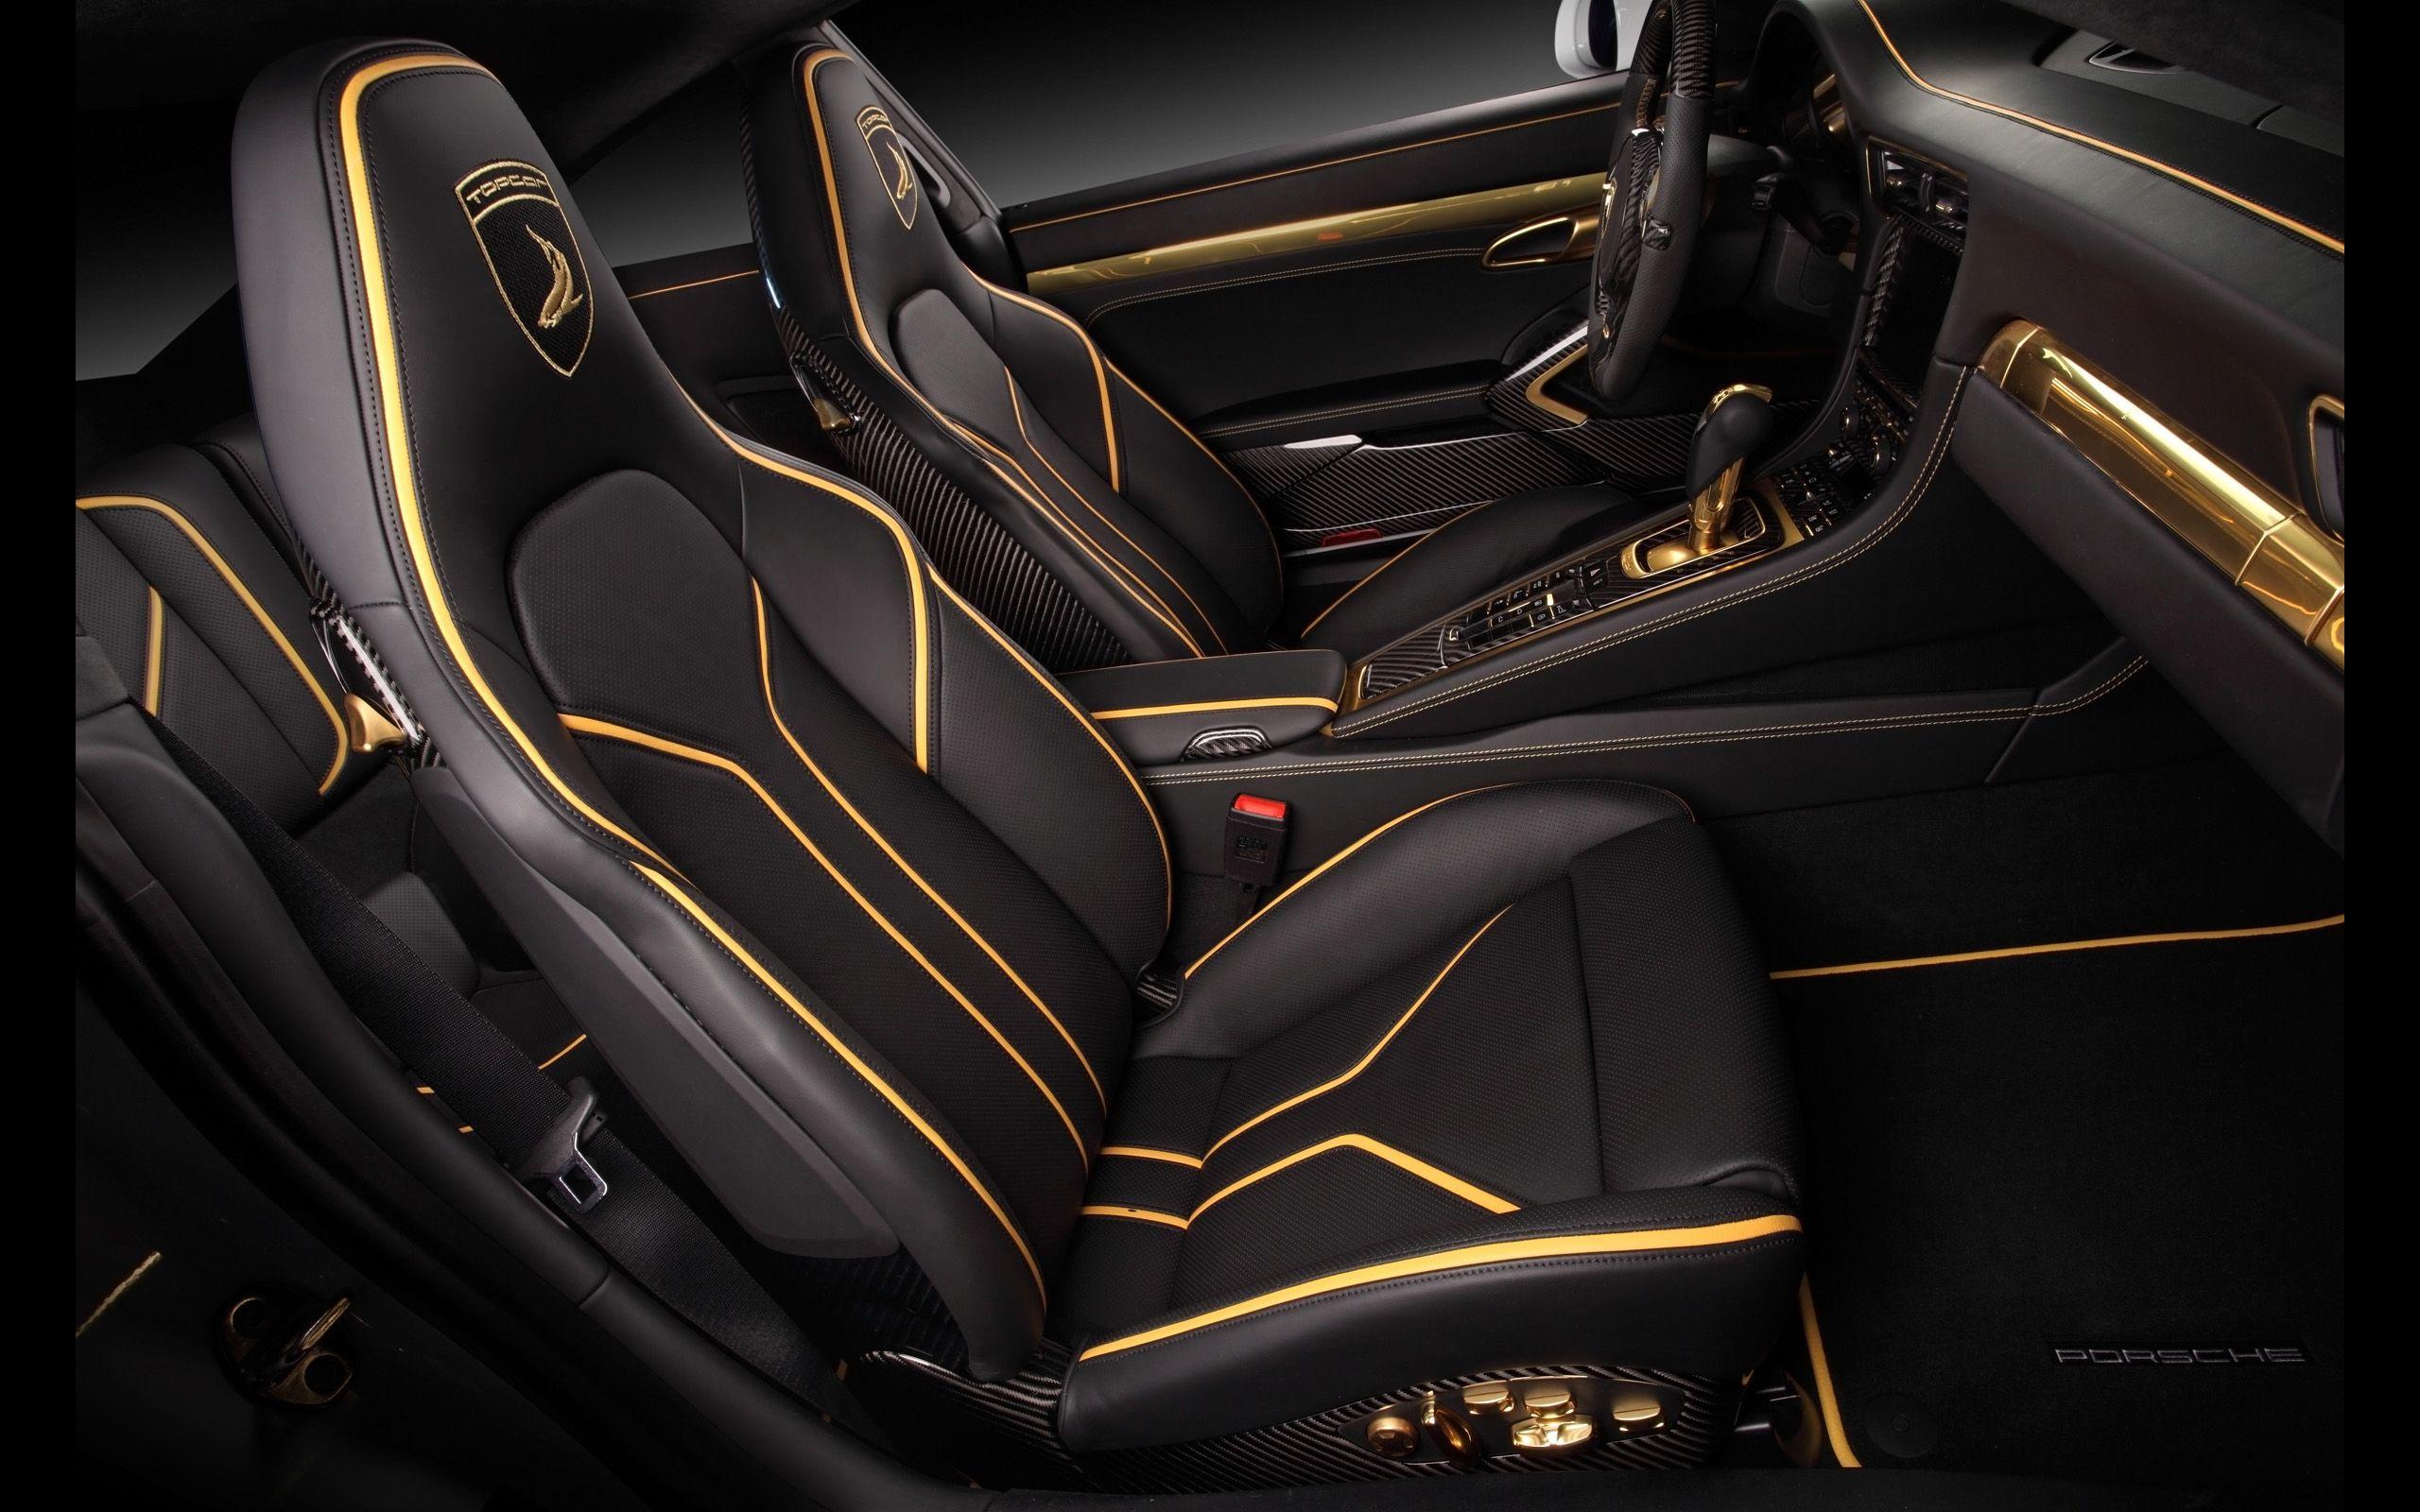 2015 topcar porsche 991 turbo stinger gtr interior 4 2560x1600 wallpaper whip misc. Black Bedroom Furniture Sets. Home Design Ideas